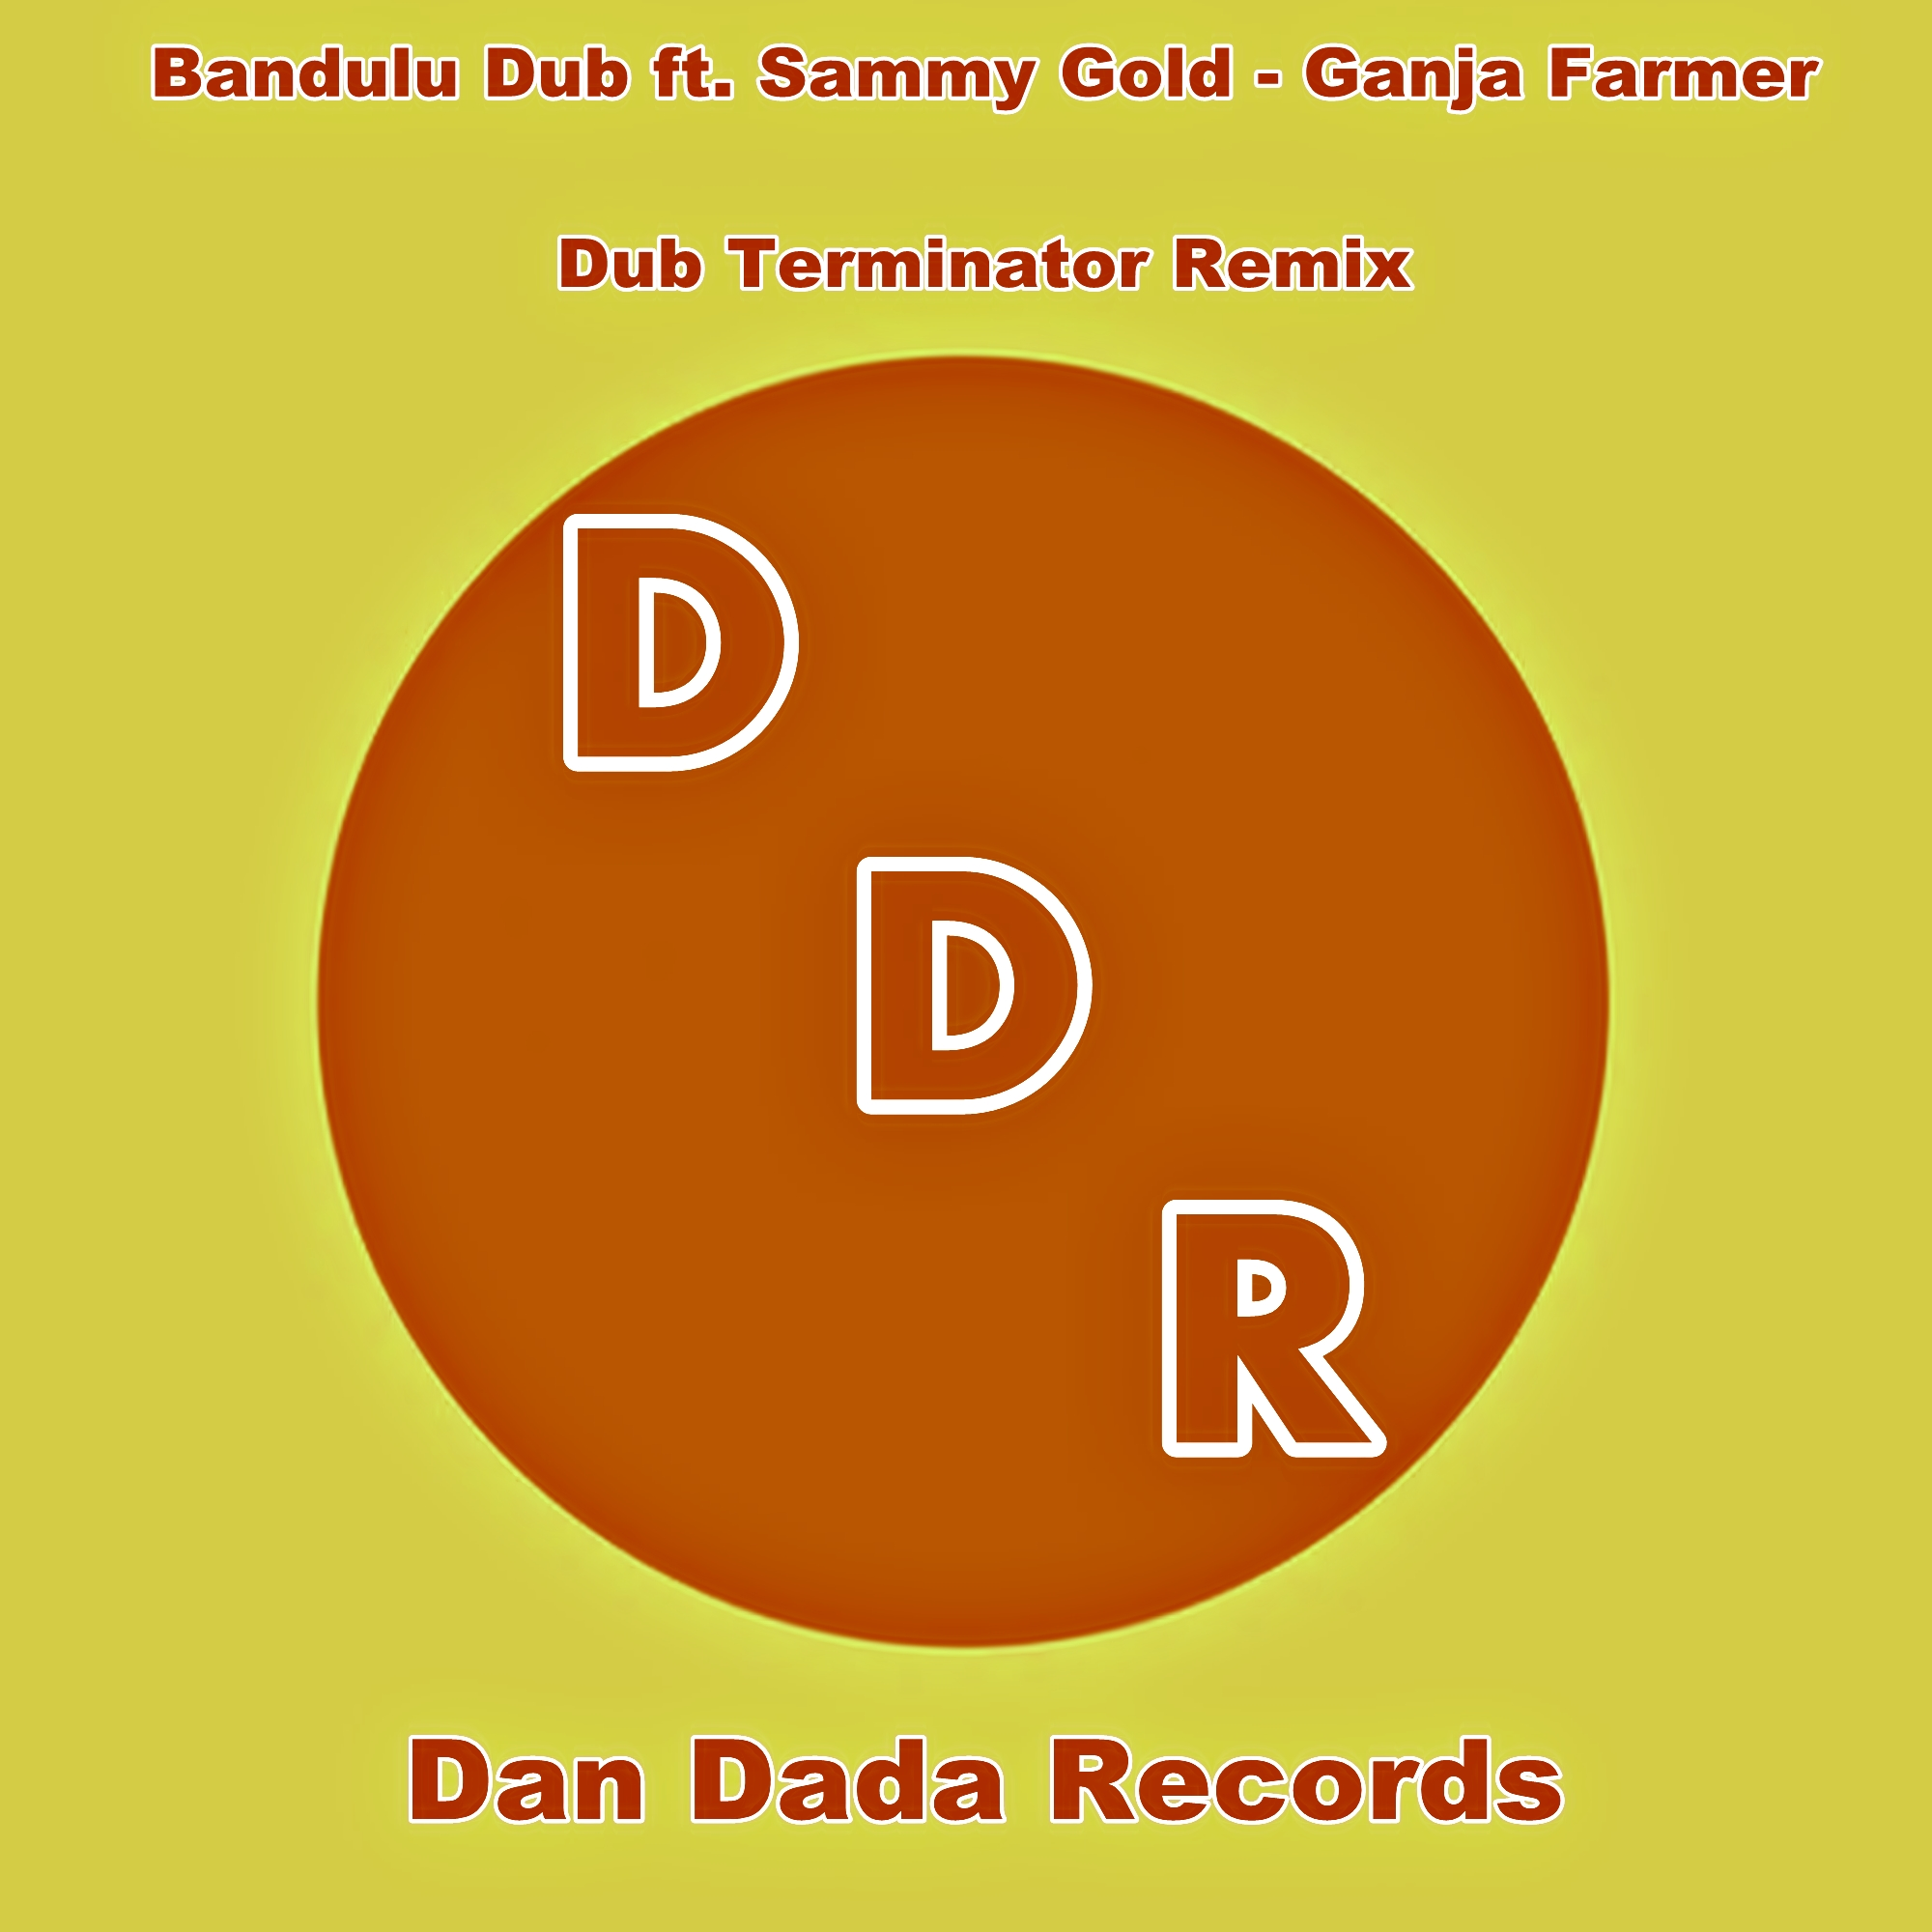 Bandulu Dub & Sammy Gold  meets Dub Terminator